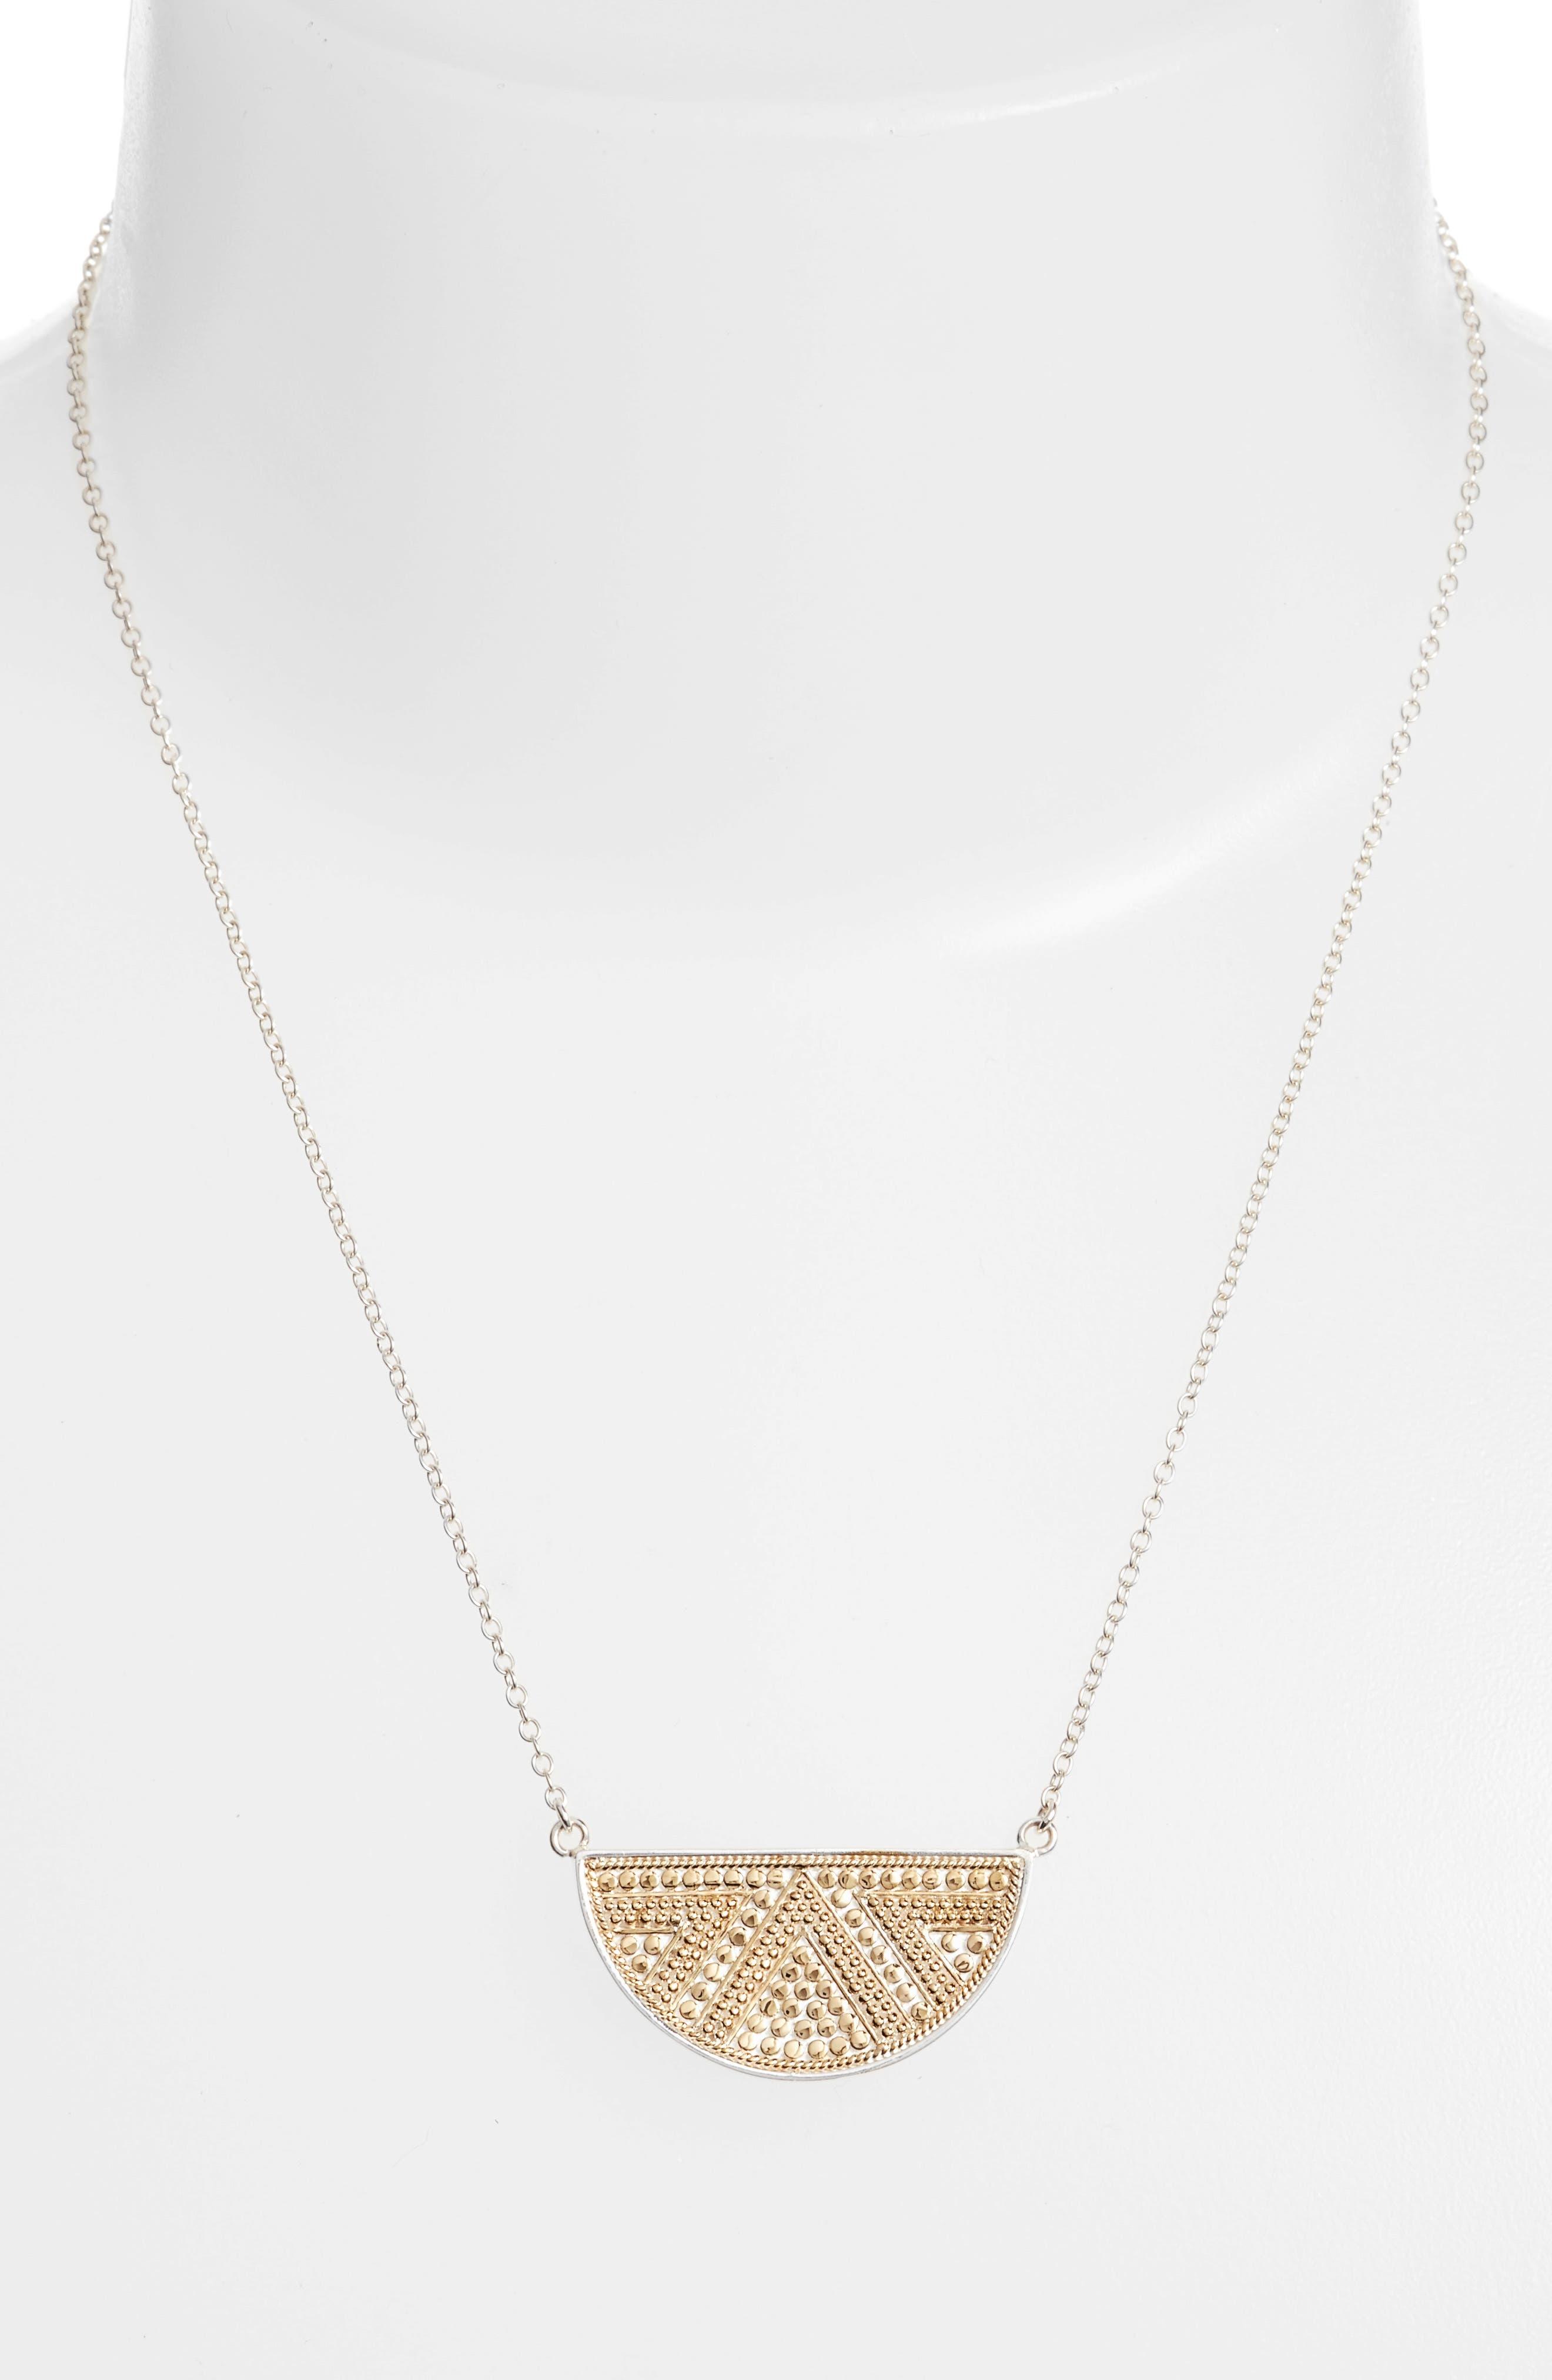 Reversible Pendant Necklace,                             Alternate thumbnail 2, color,                             GOLD/ SILVER